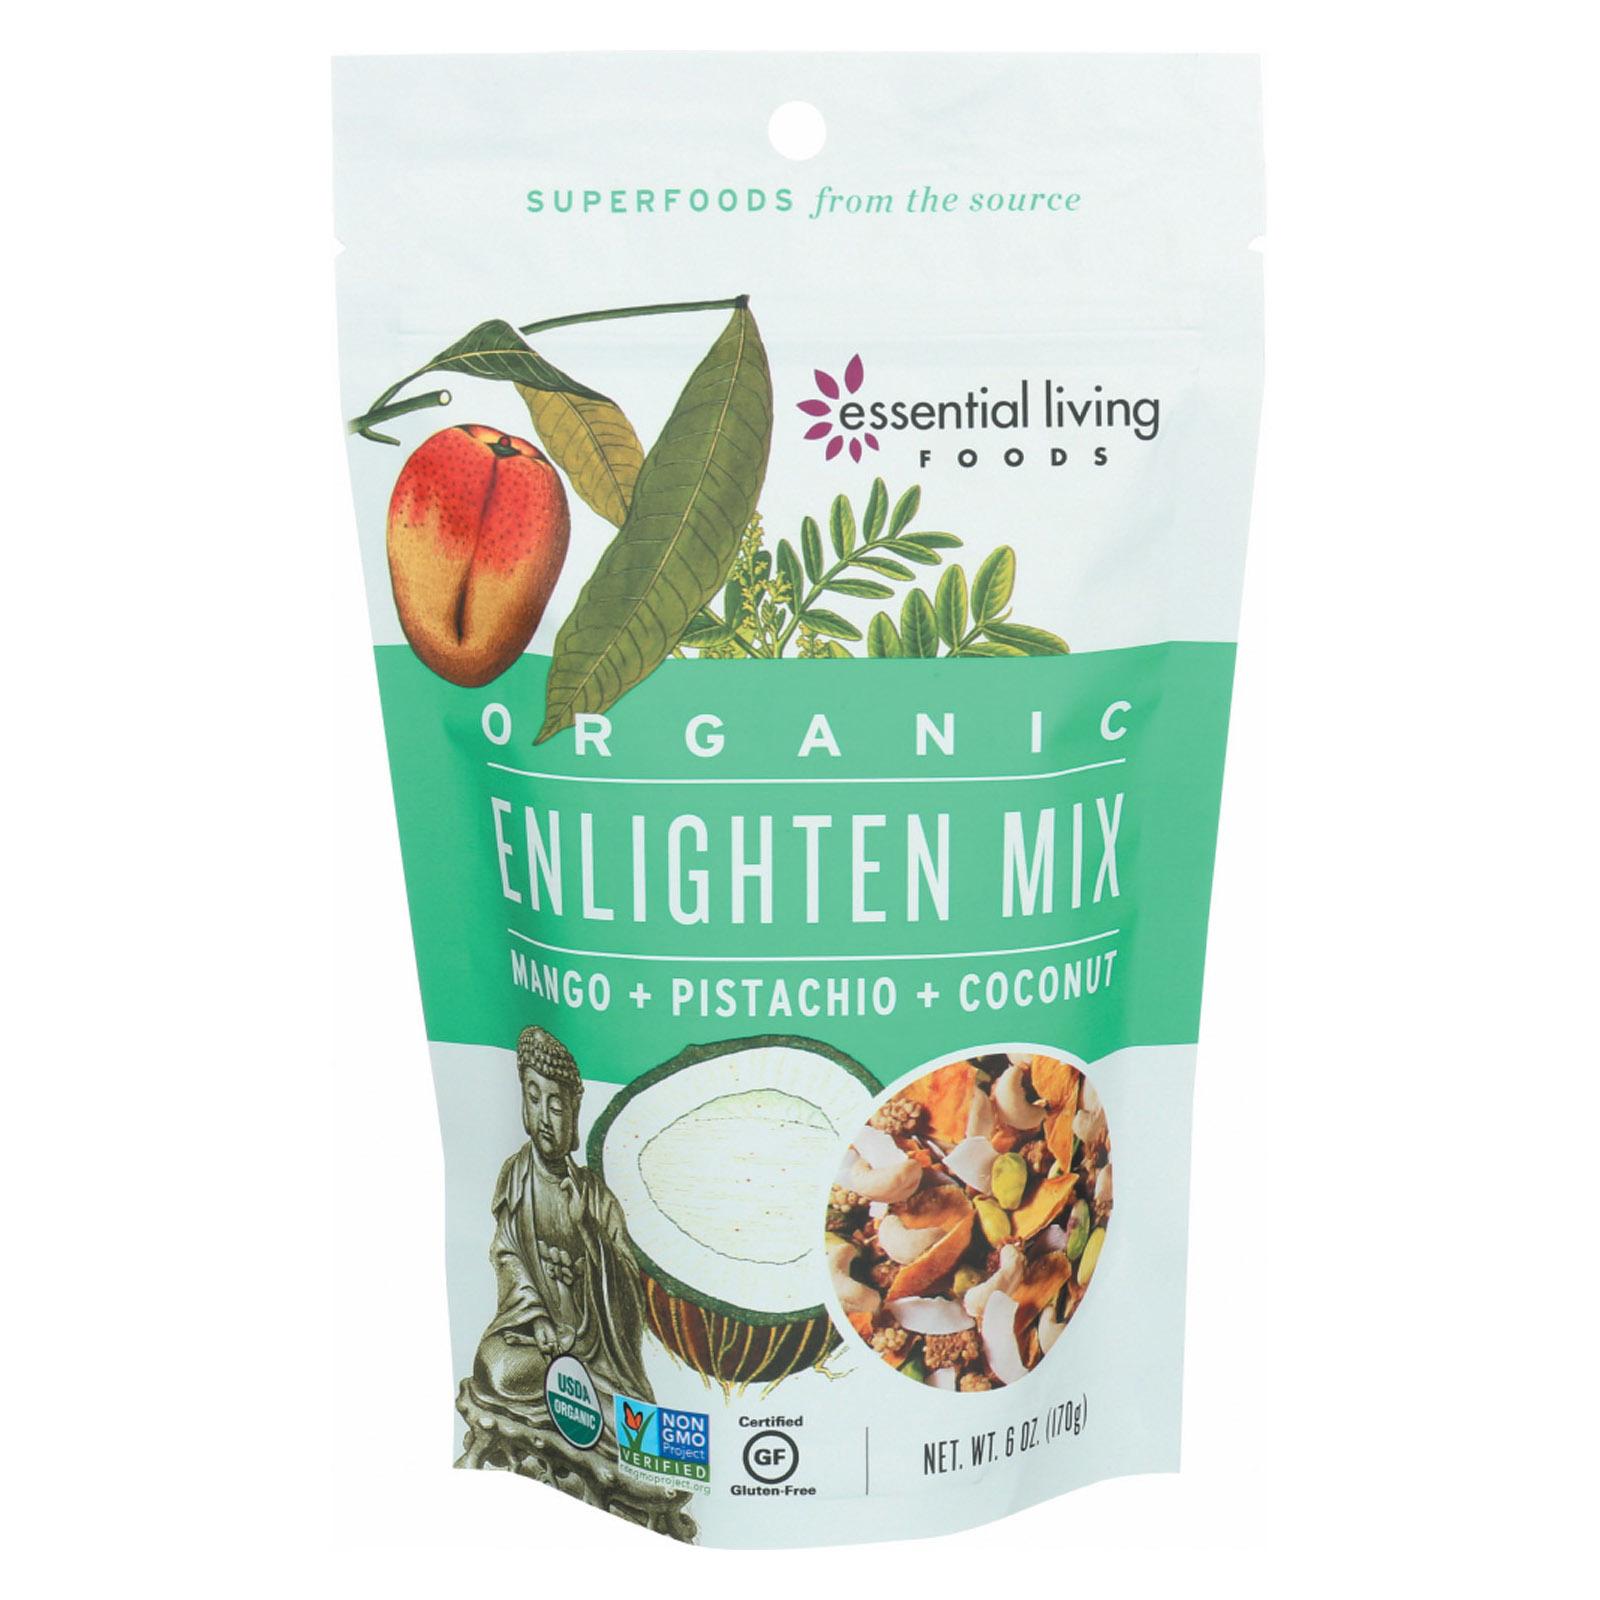 Essential Living Foods Organic Enlighten Mix - Mango Pistachio and Coconut - Case of 6 - 6 oz.